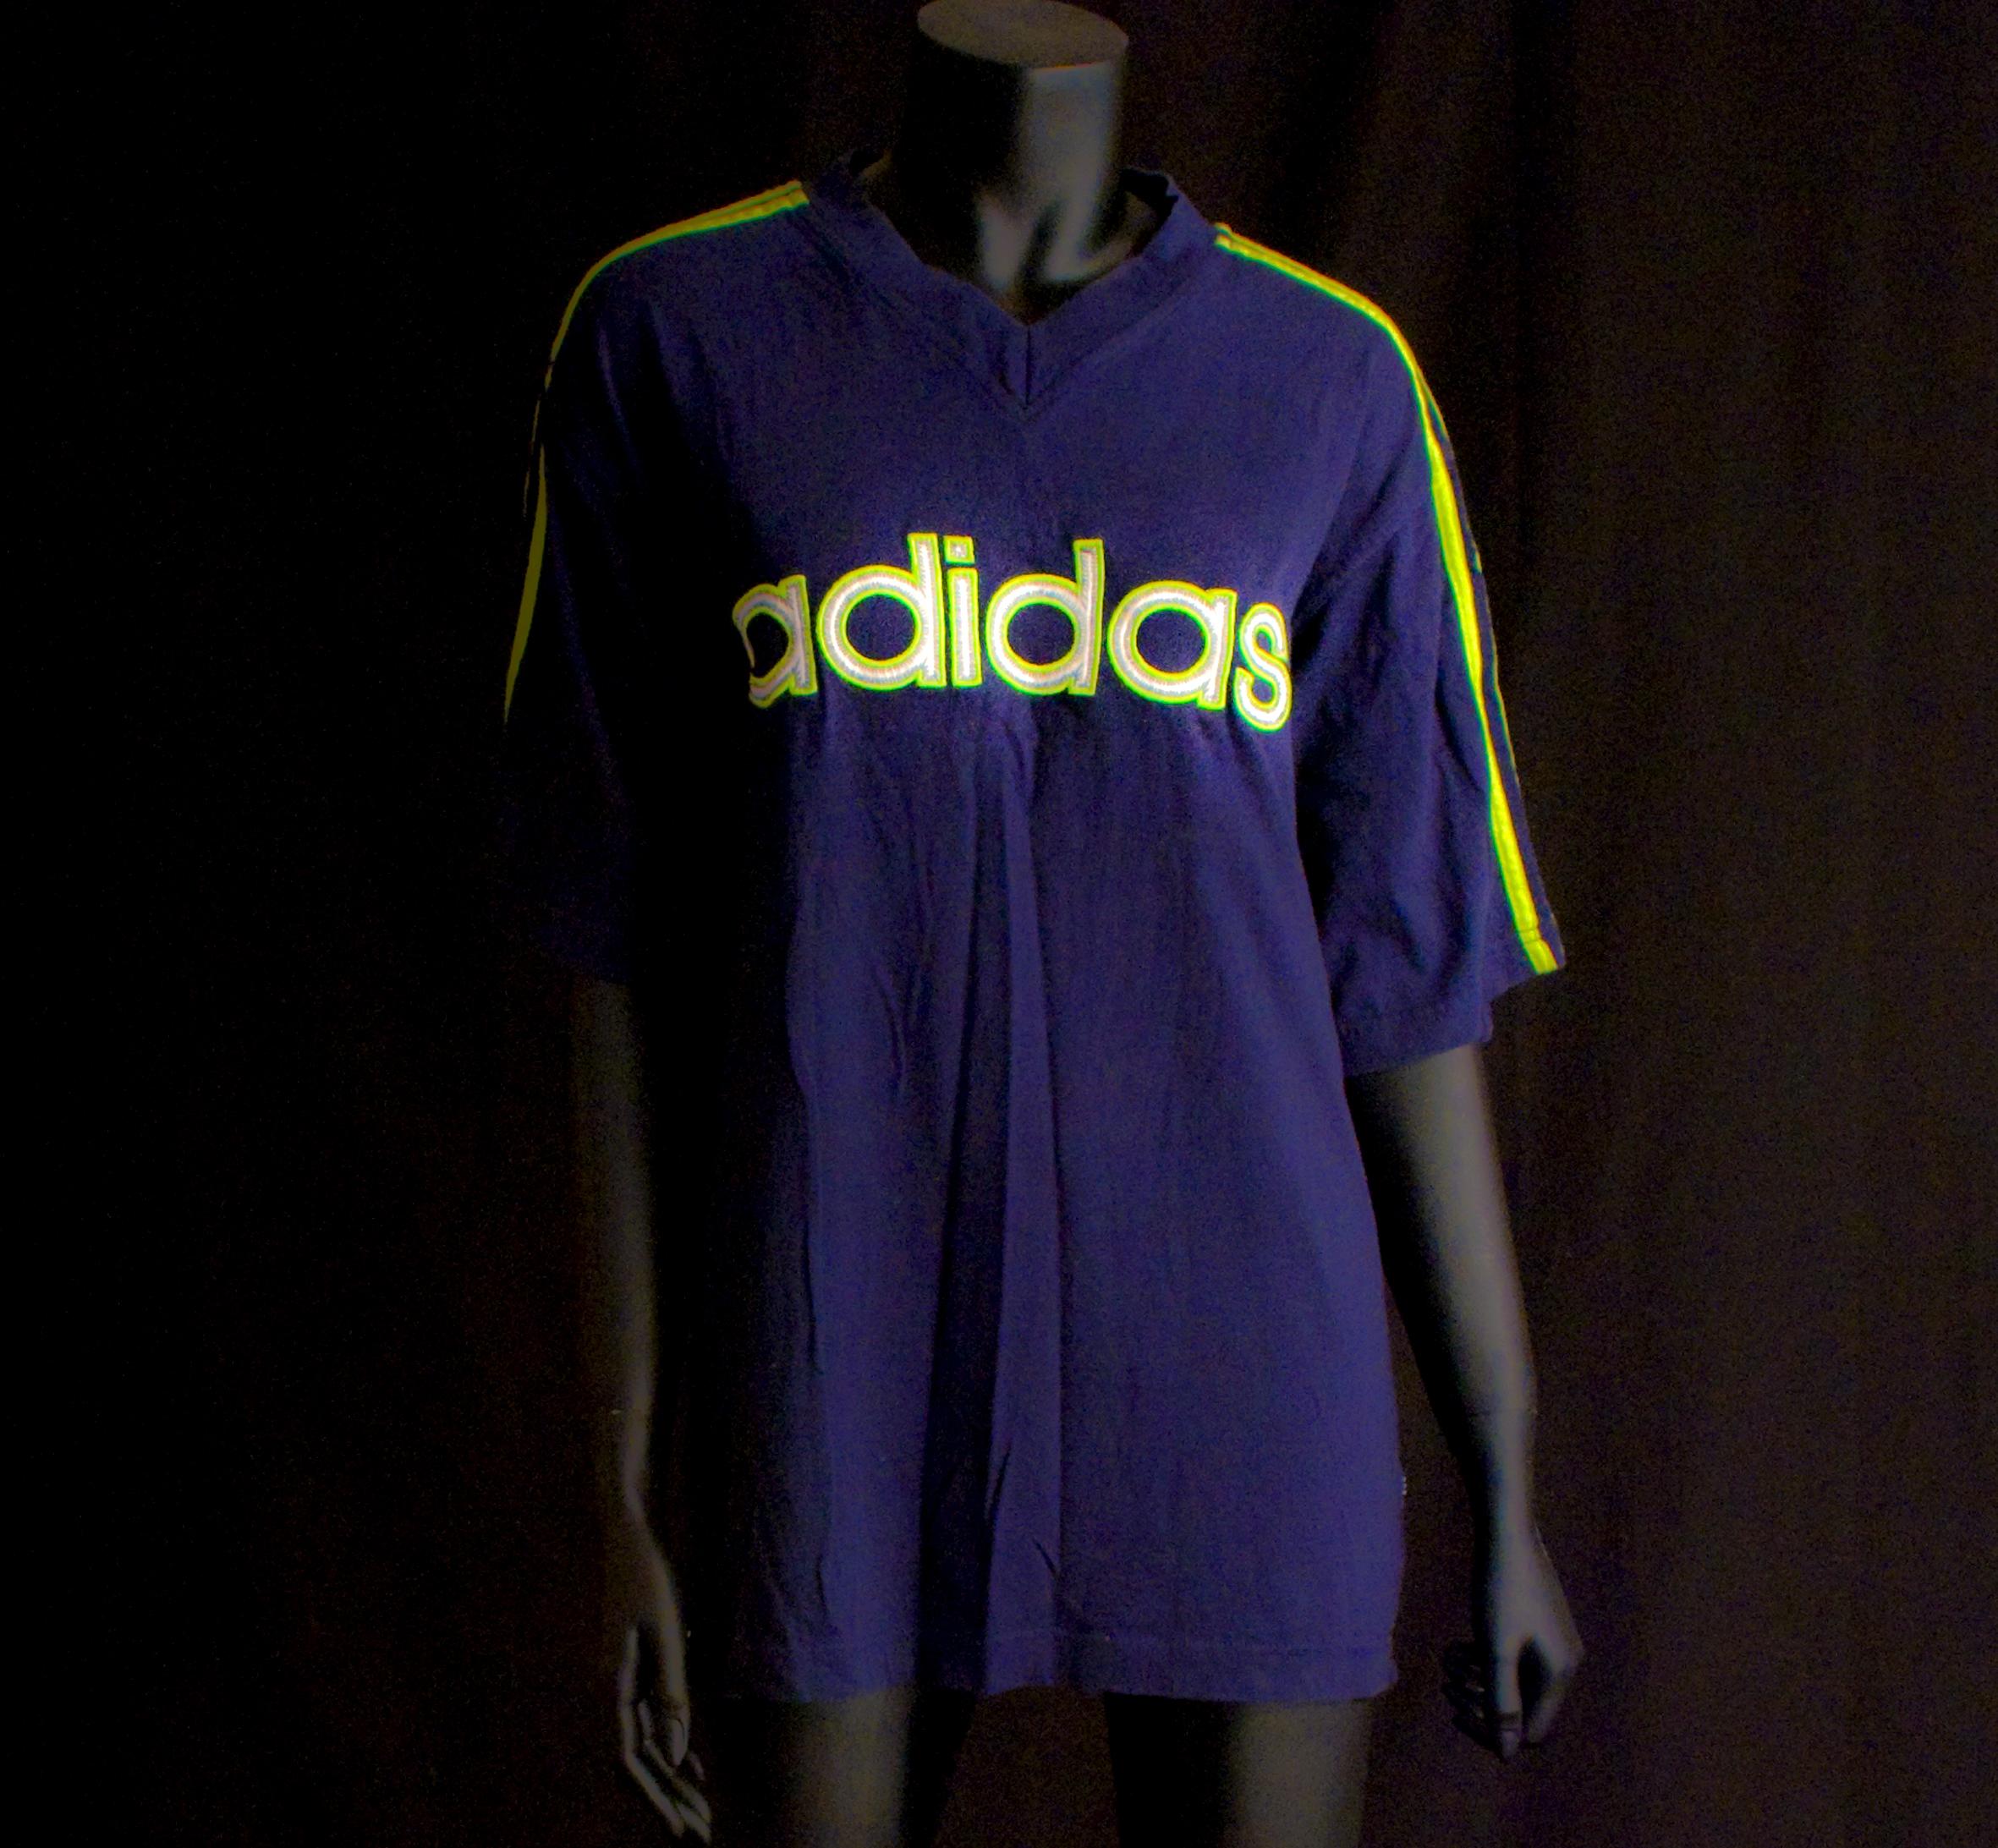 Mel C Adidas T-shirt 300 HQ.jpg